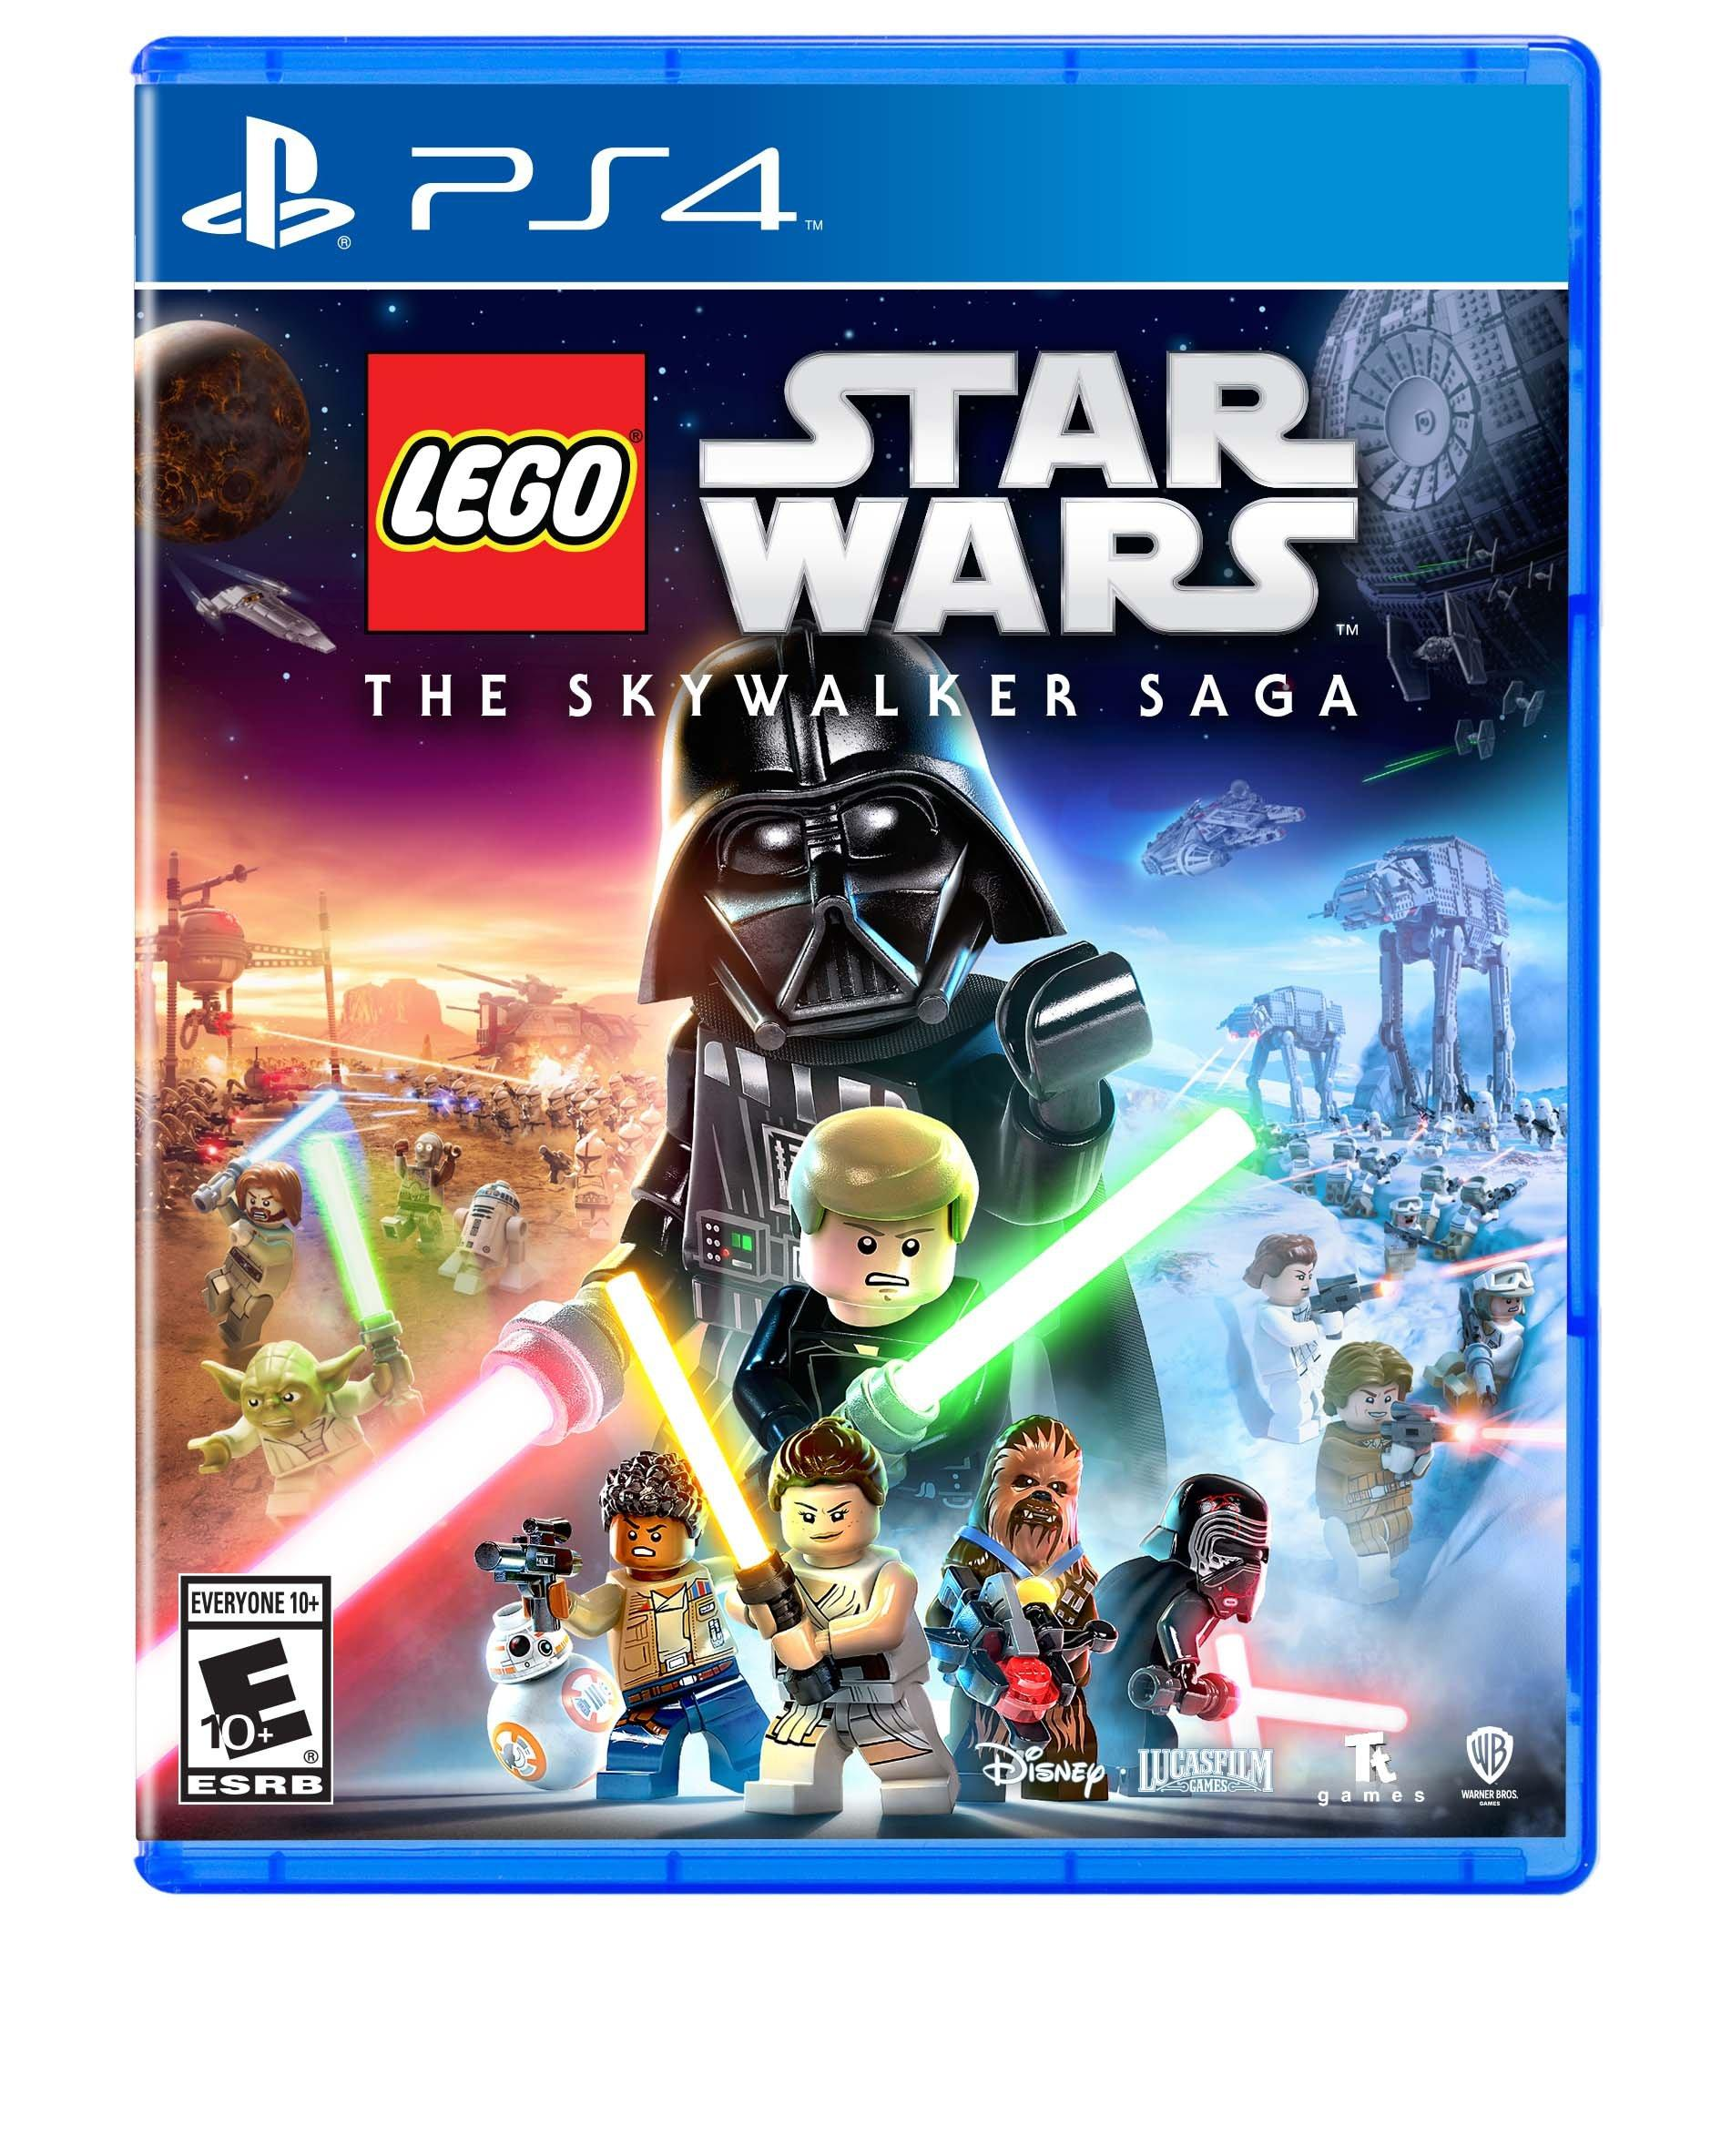 Lego Star Wars The Skywalker Saga Playstation 4 Gamestop